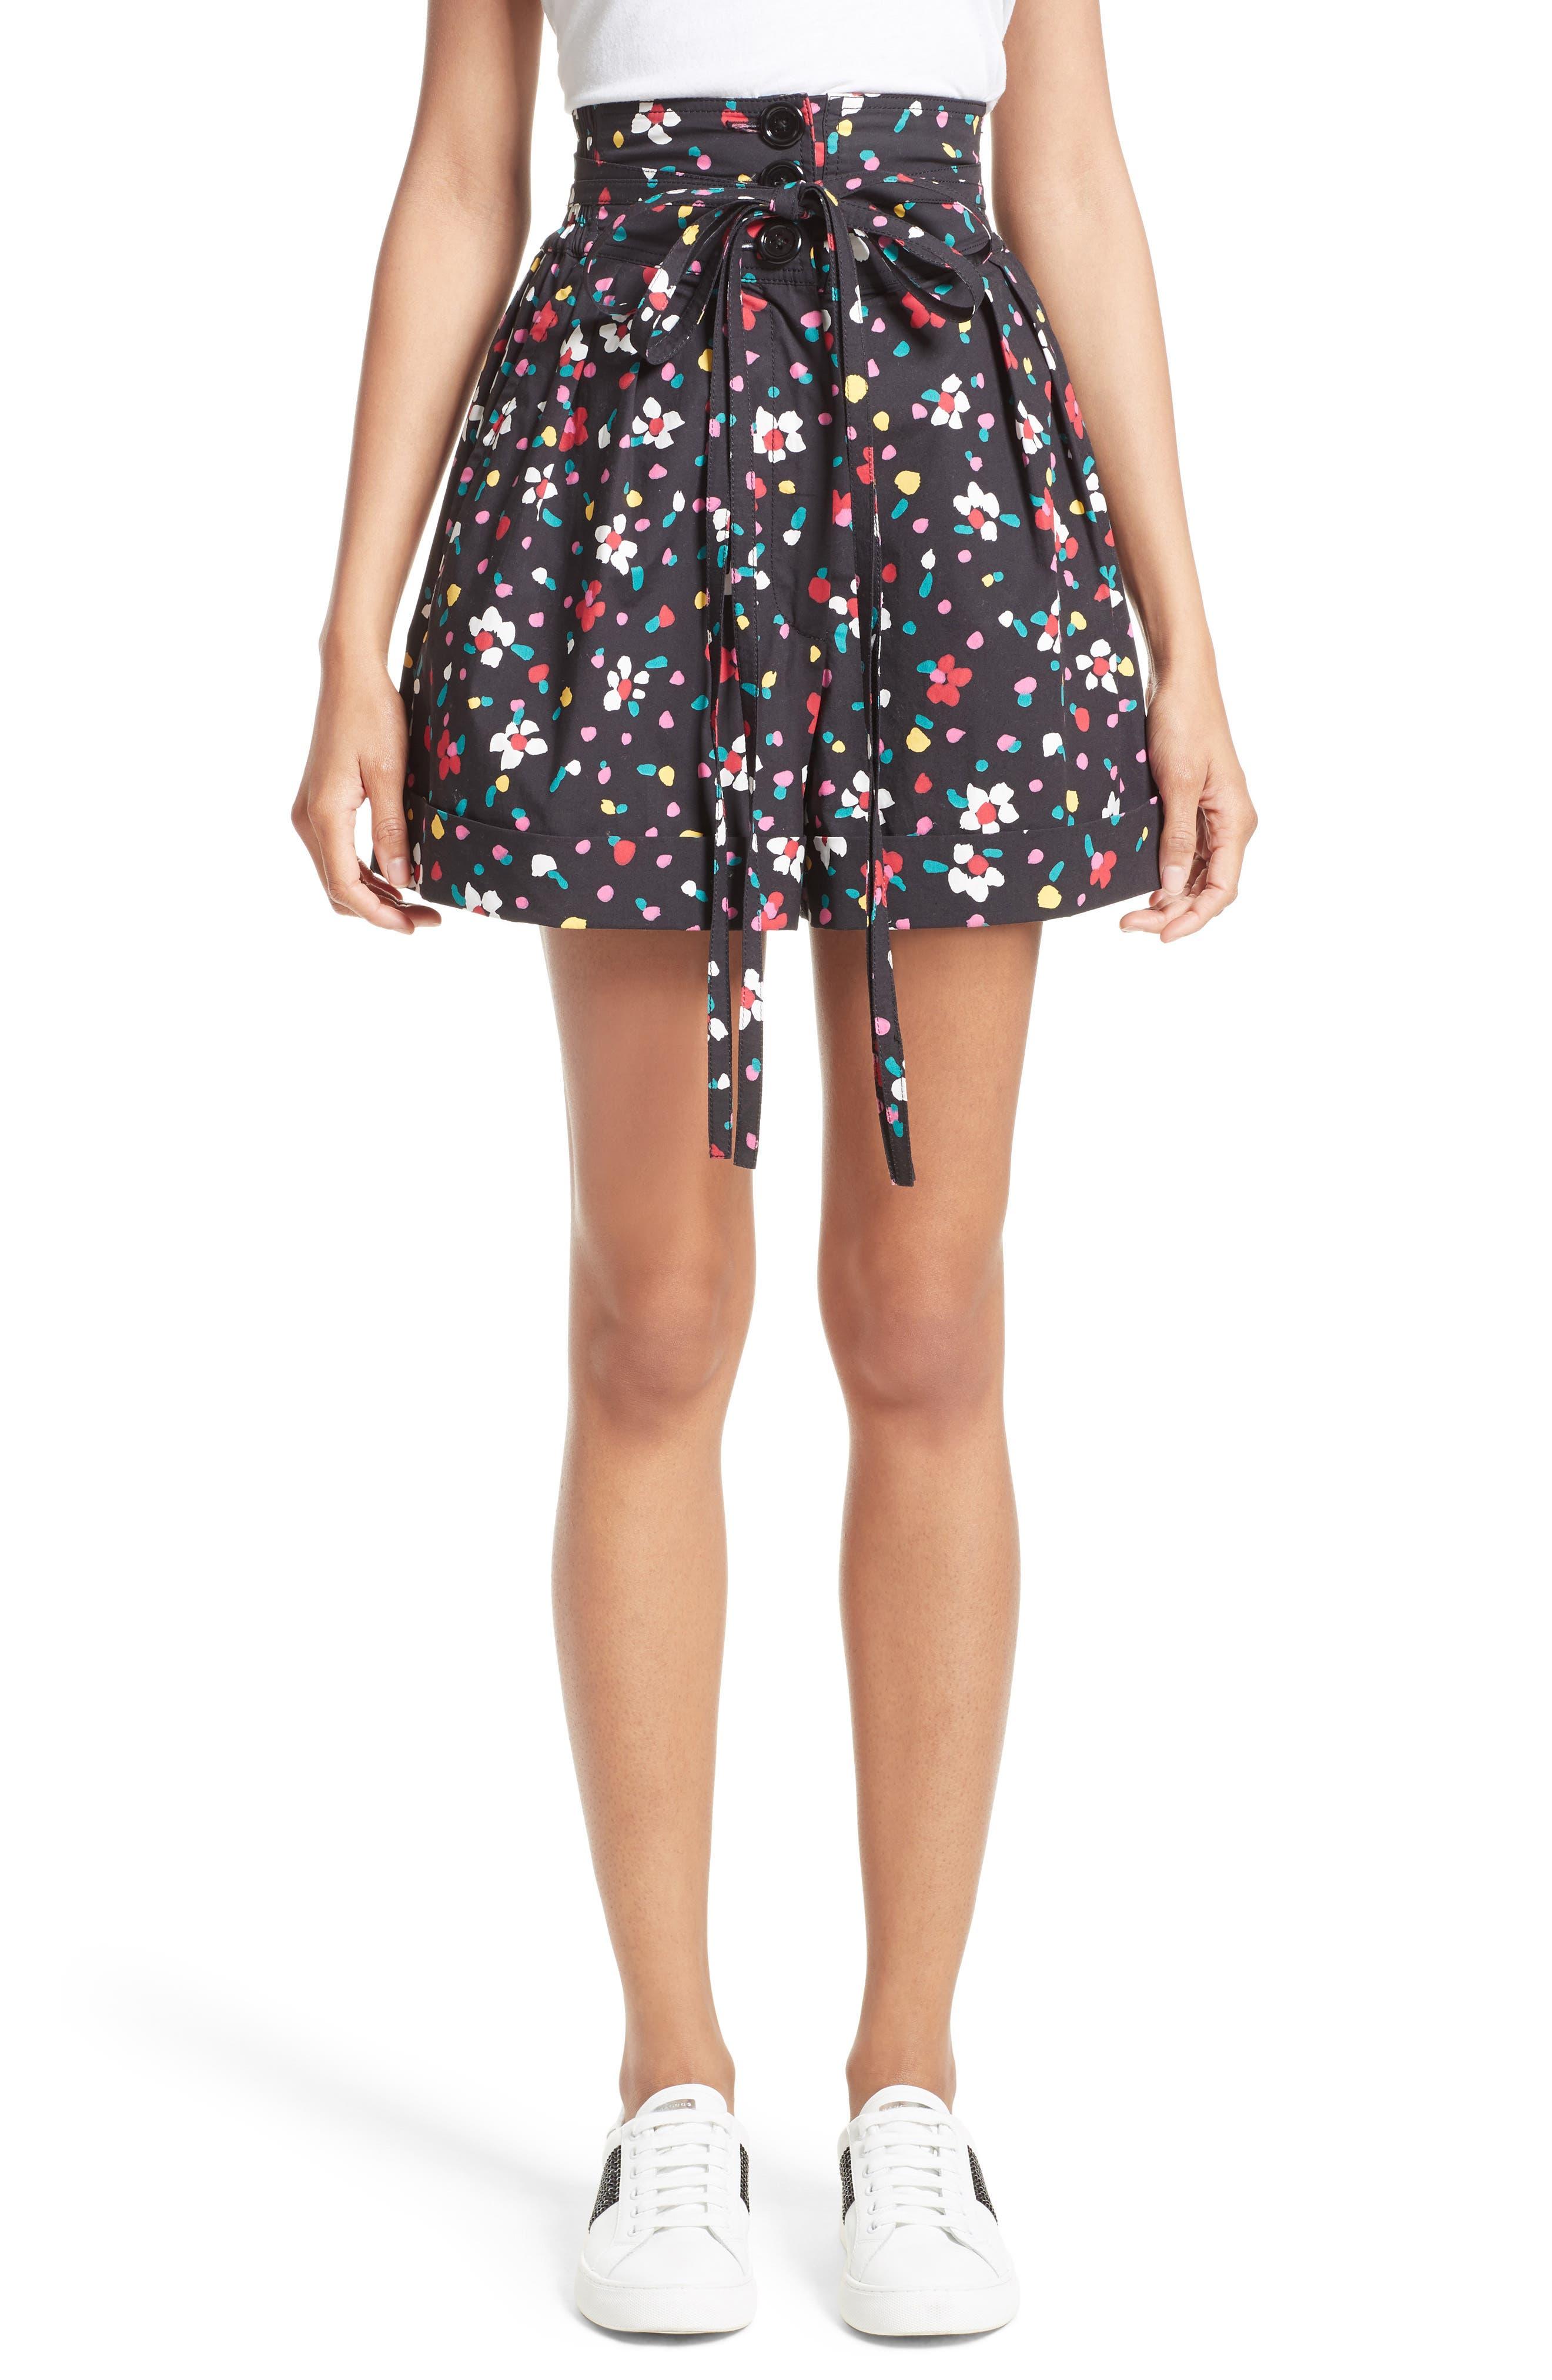 MARC JACOBS Floral Cotton High Waist Shorts